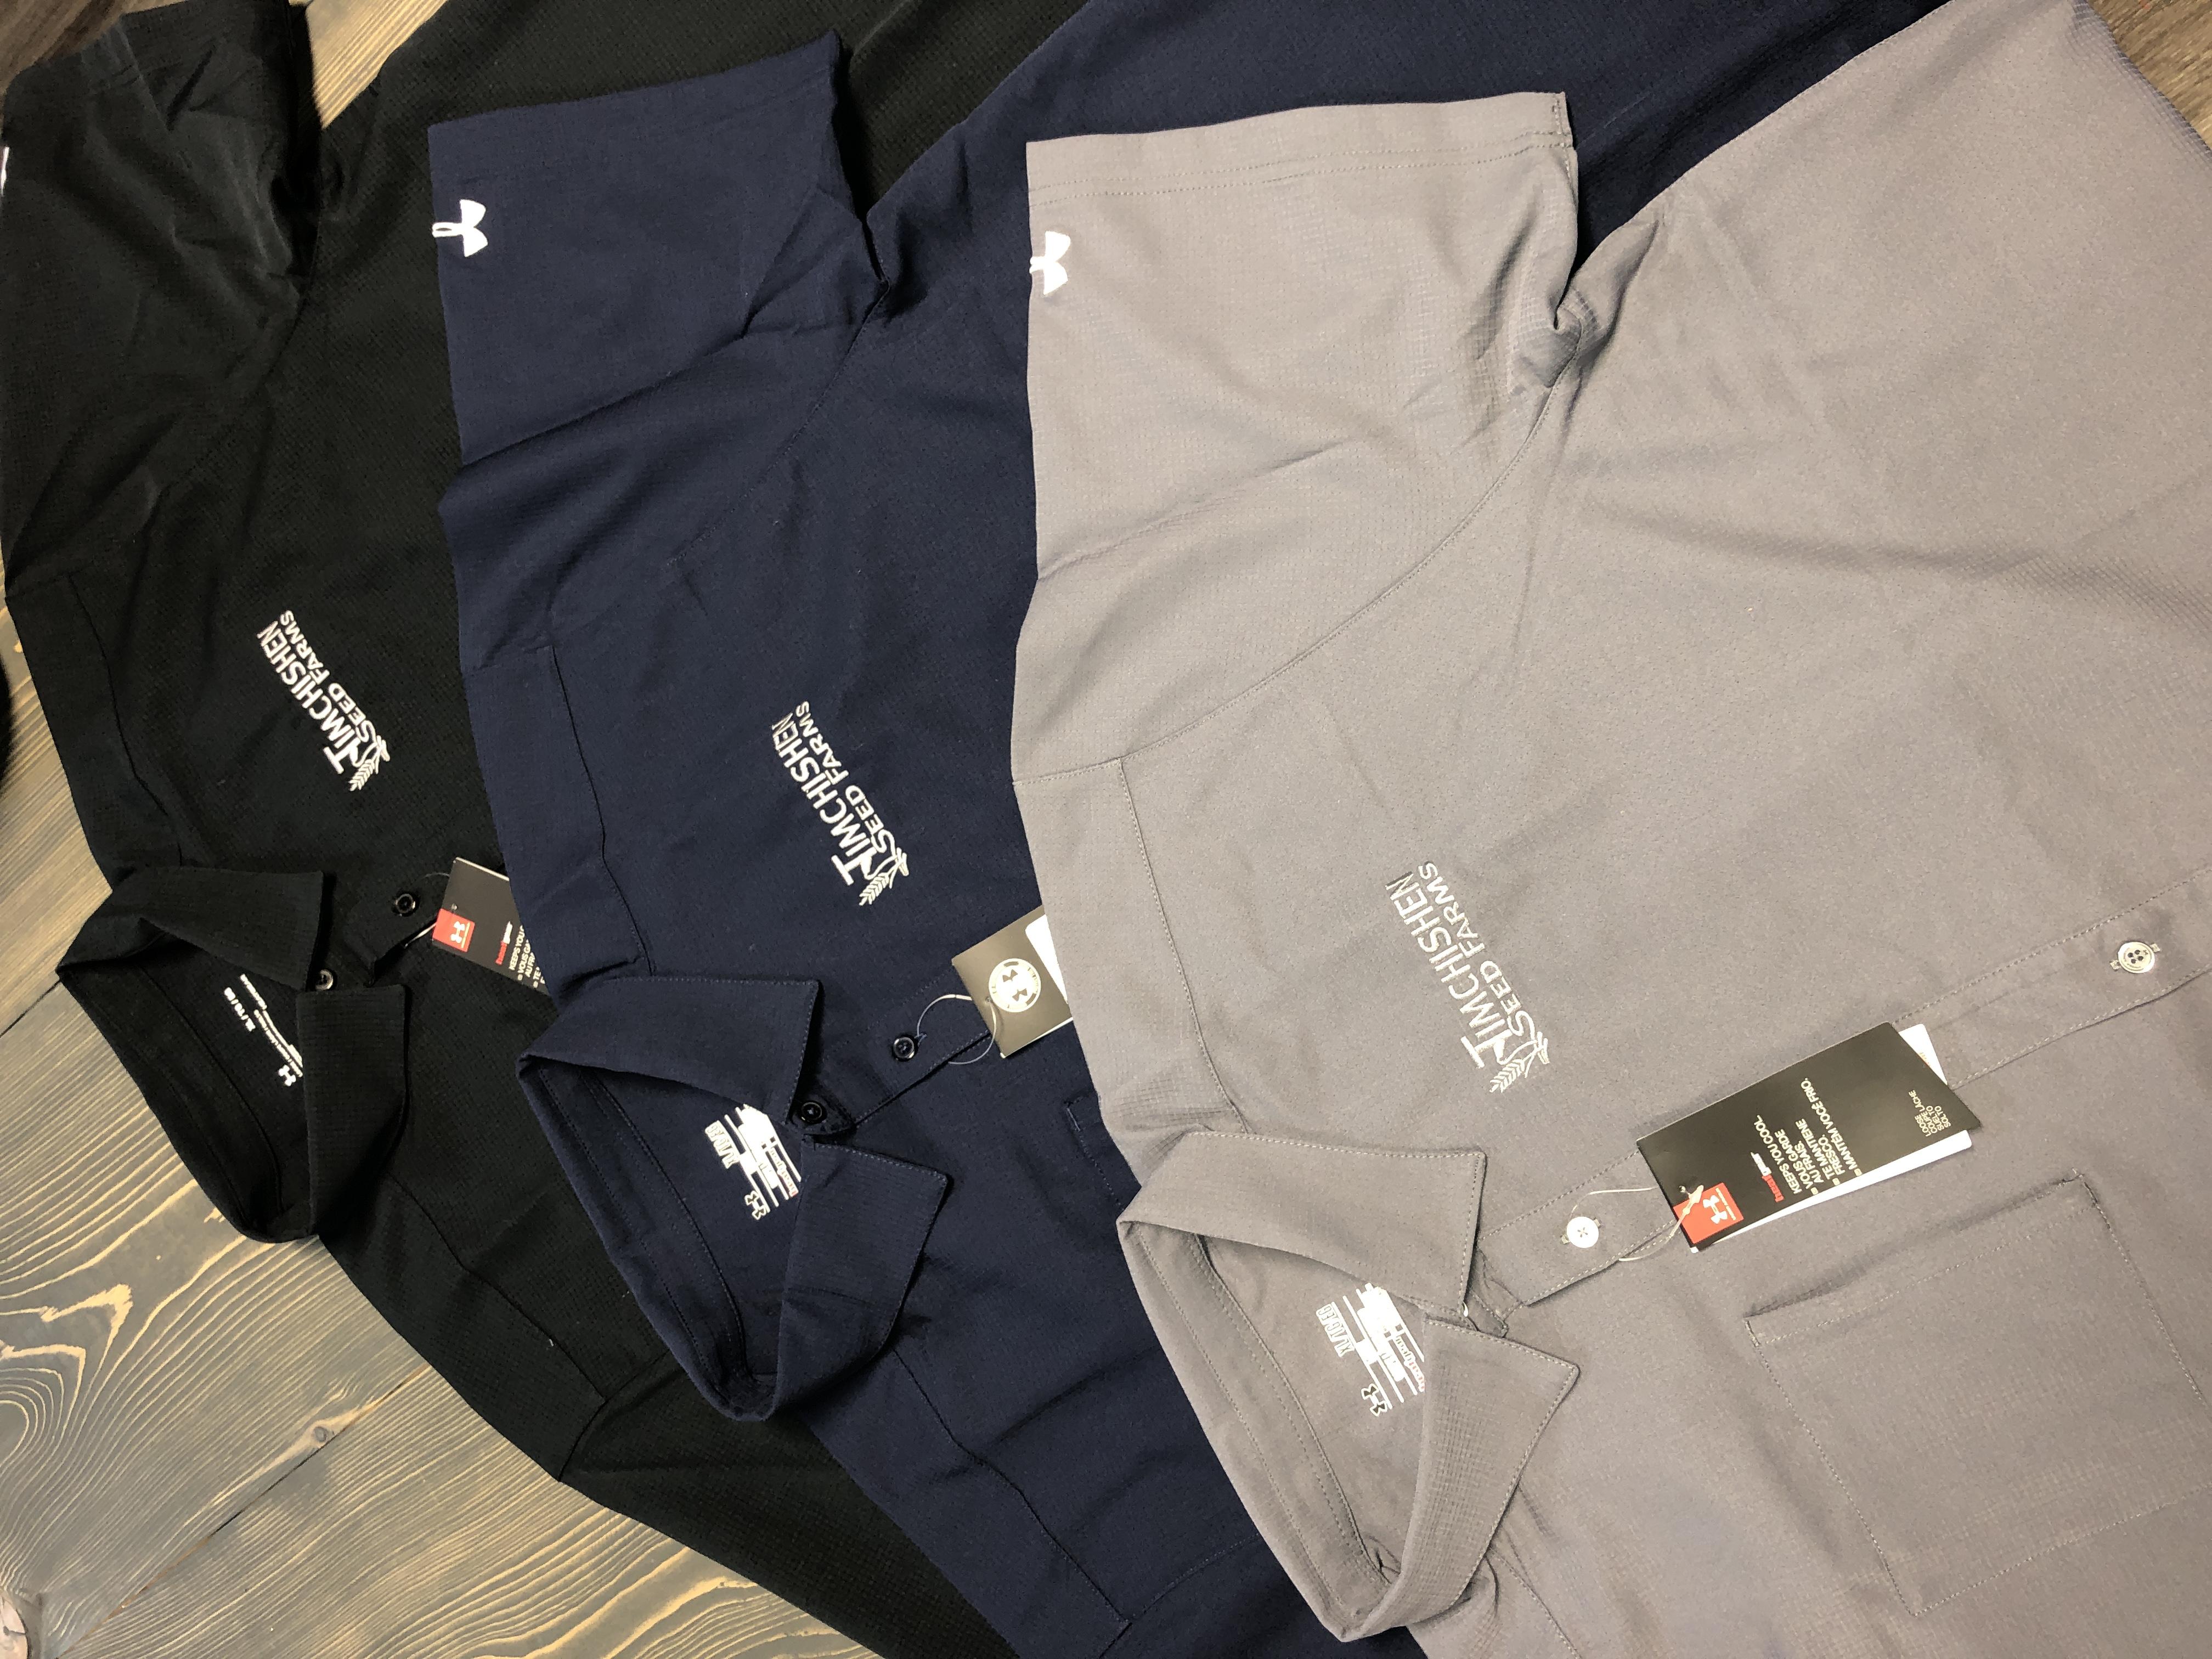 under-armour-short-sleeve-button-ups-corporate-concepts-winnipeg